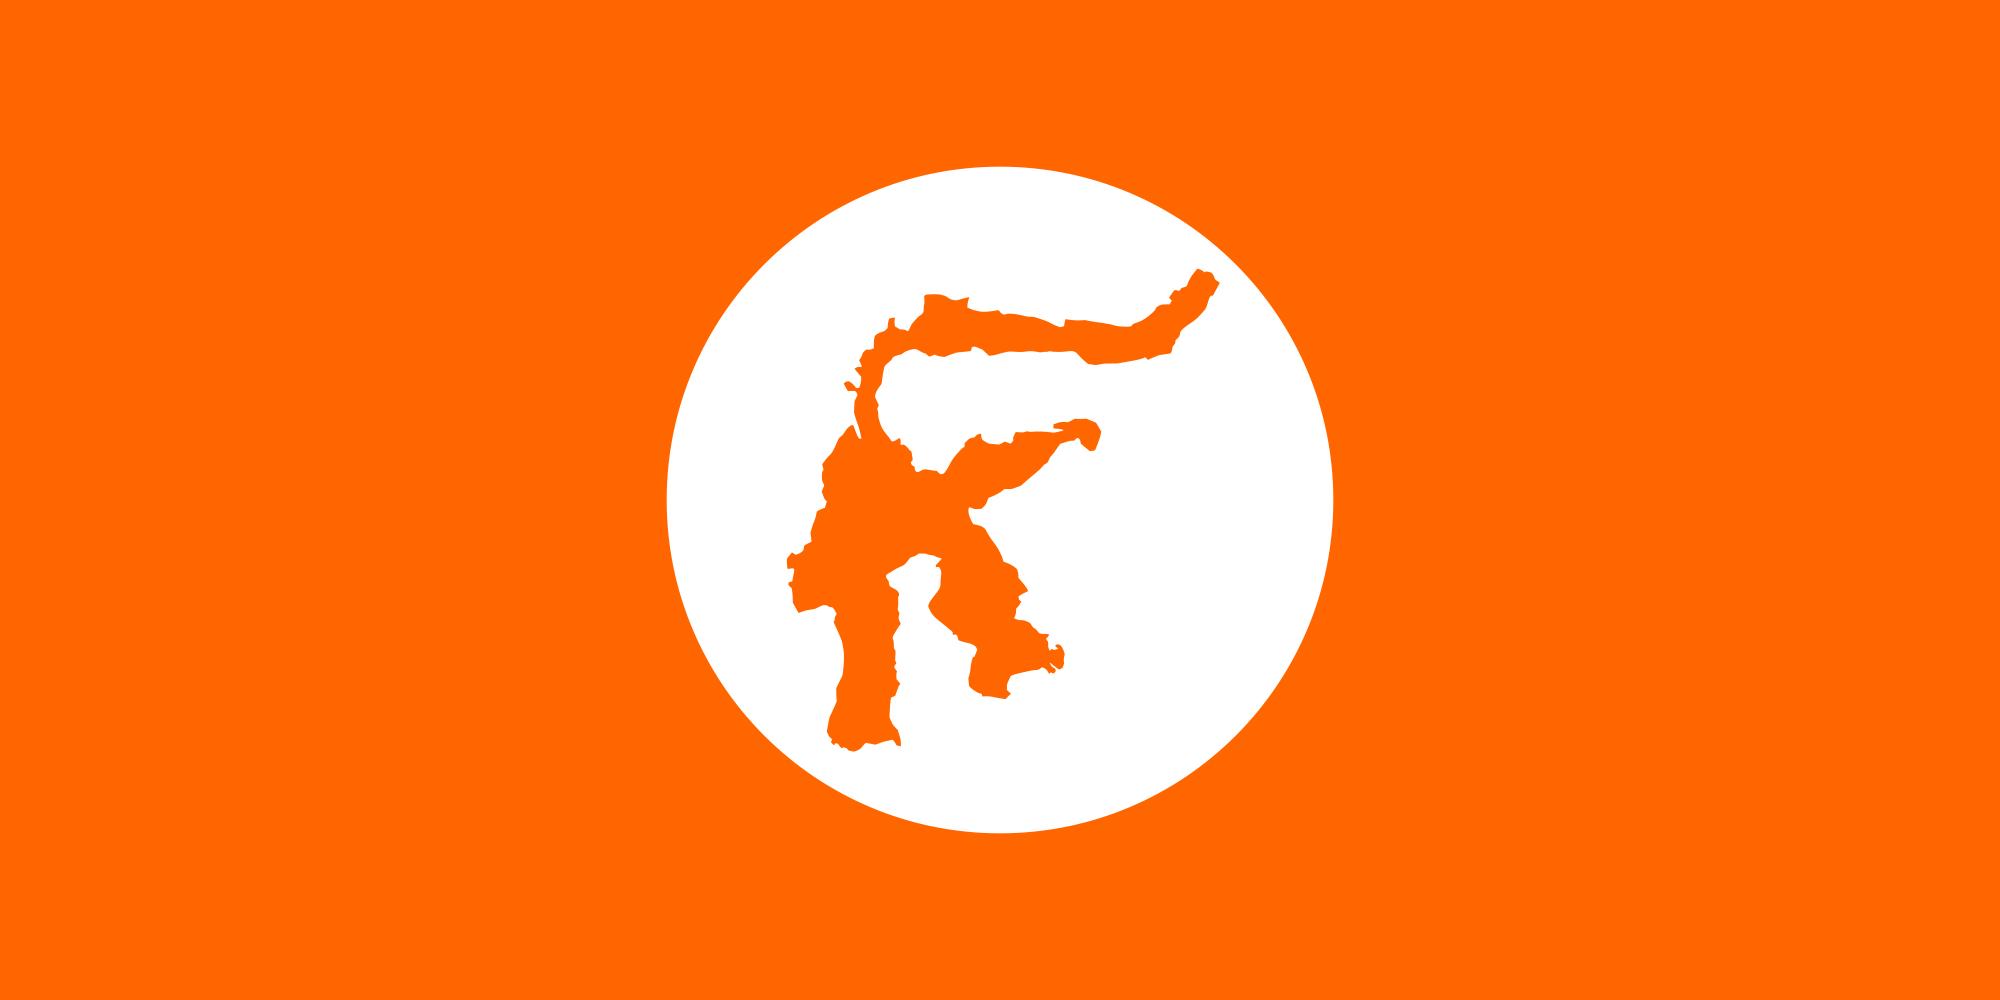 Célebes (MNI)